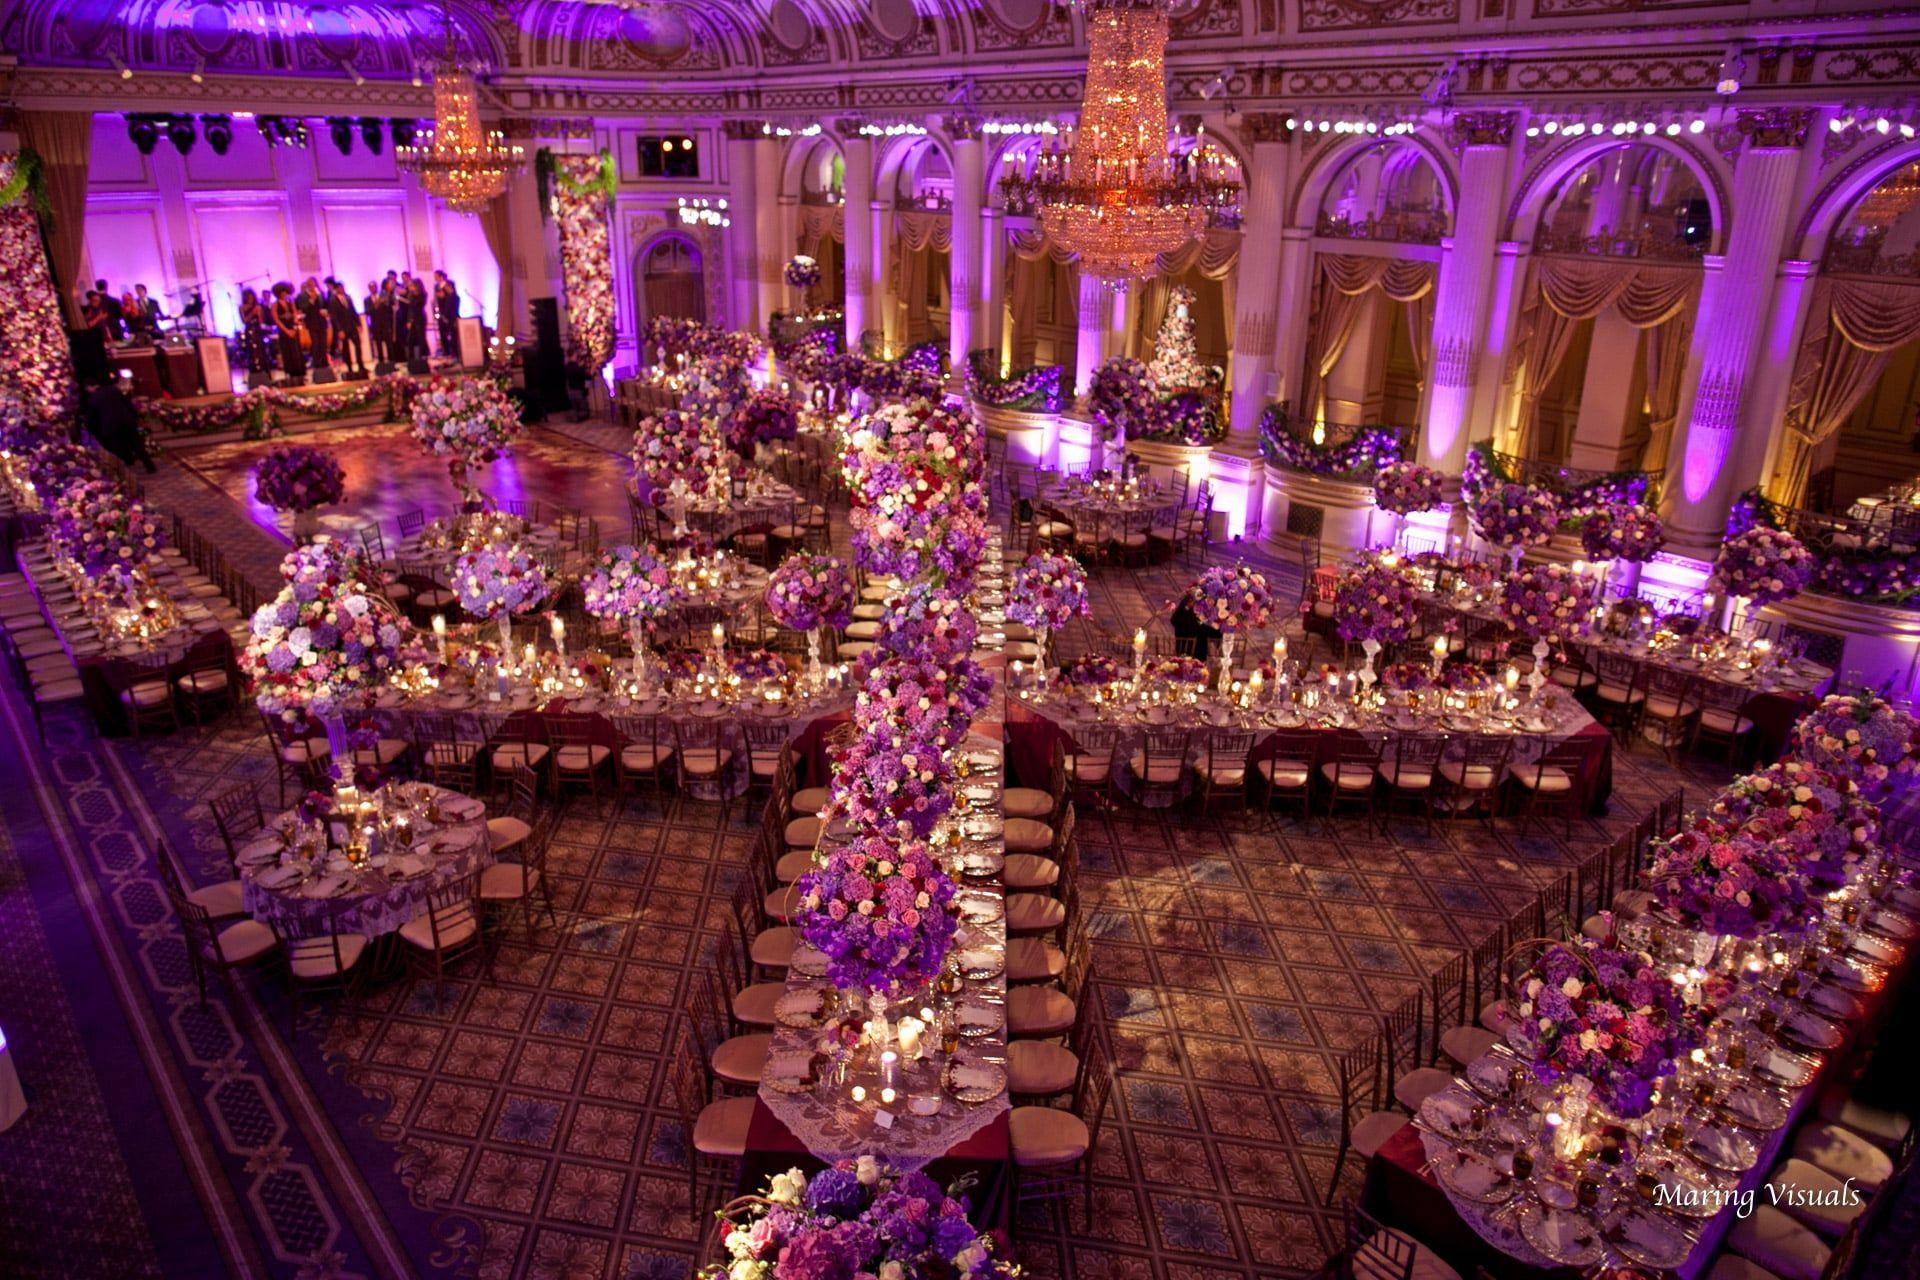 Wedding Design by David Tutera at The Plaza Hotel NyC